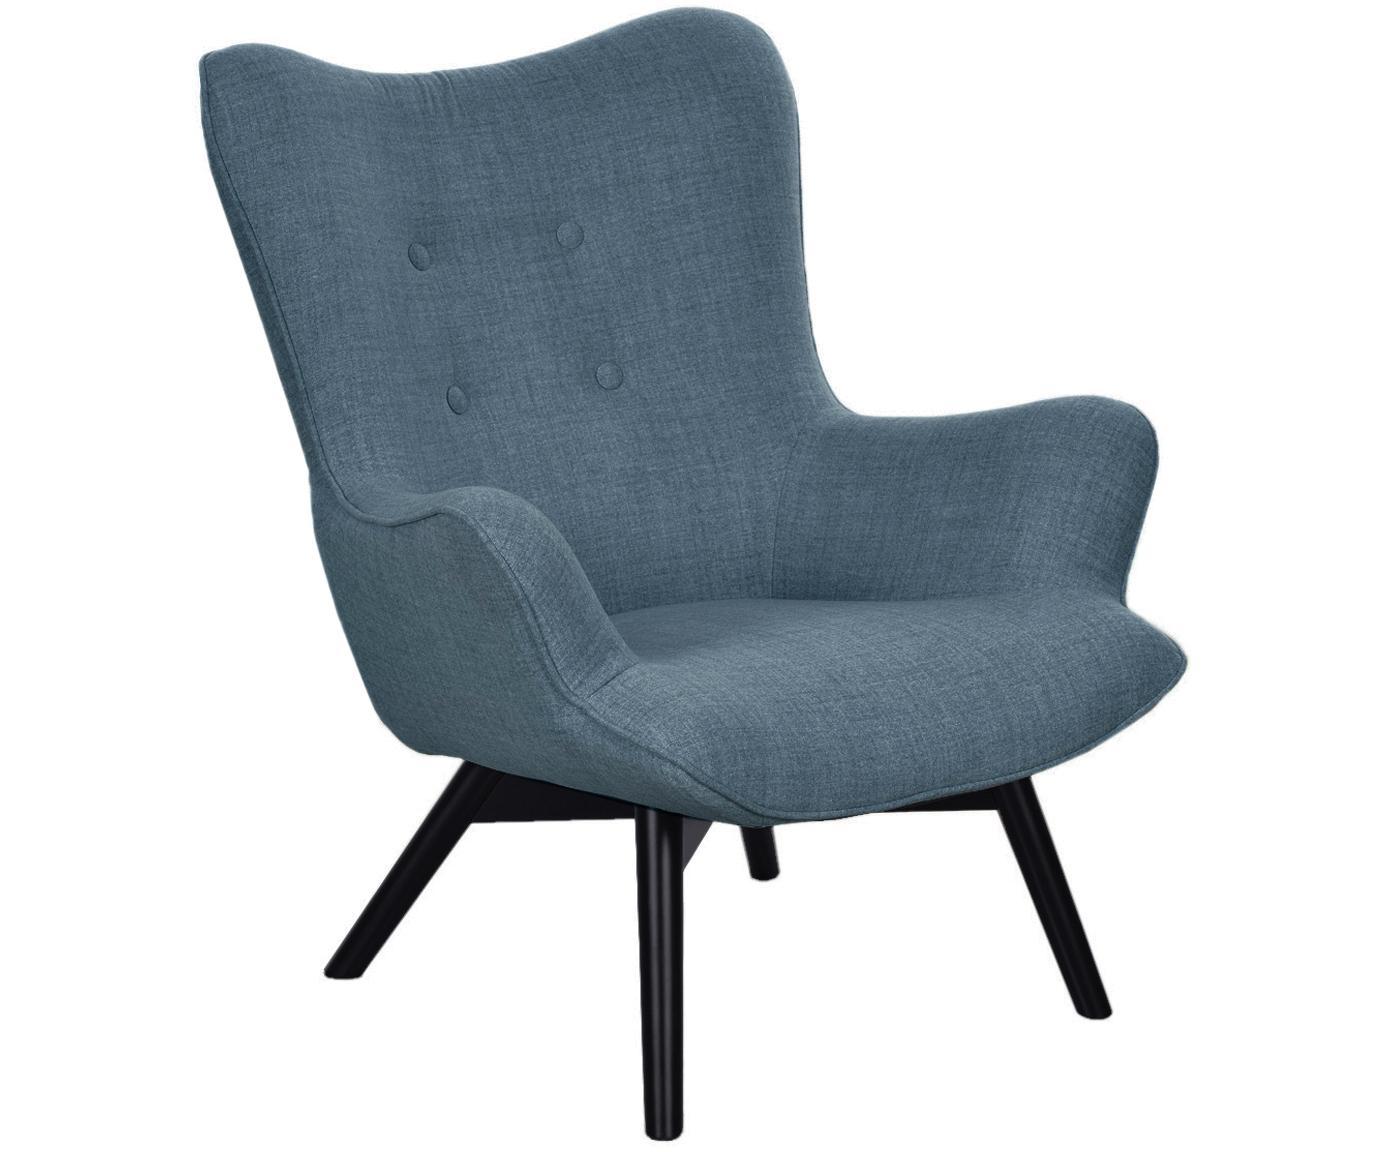 Fauteuil Twist, Frame: Hout, Poten: Beukenhout, Hoes: Blauw. Poten: Zwart, 82 x 96 cm